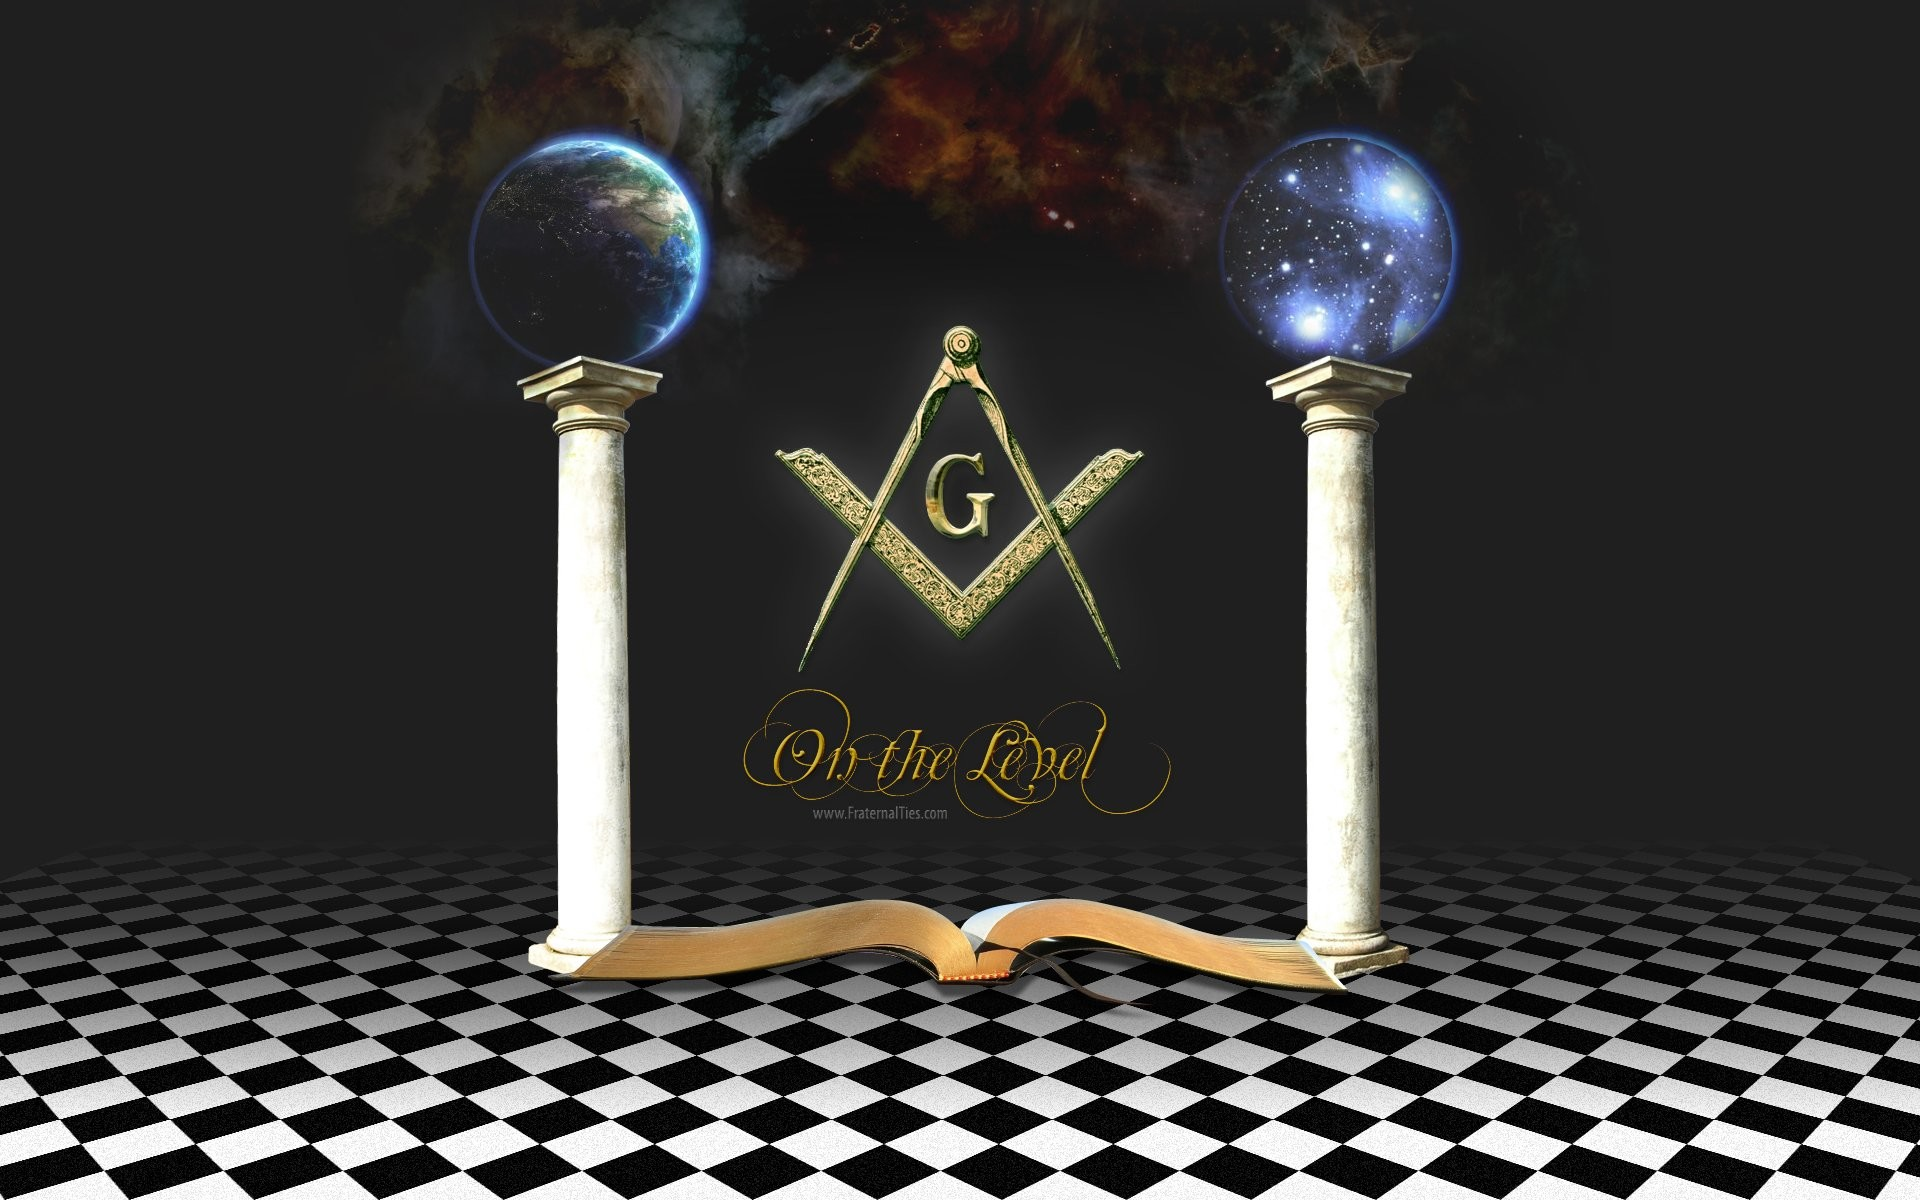 Free Masonic Wallpaper Cool HD Wallpapers 1280×768 · Share …